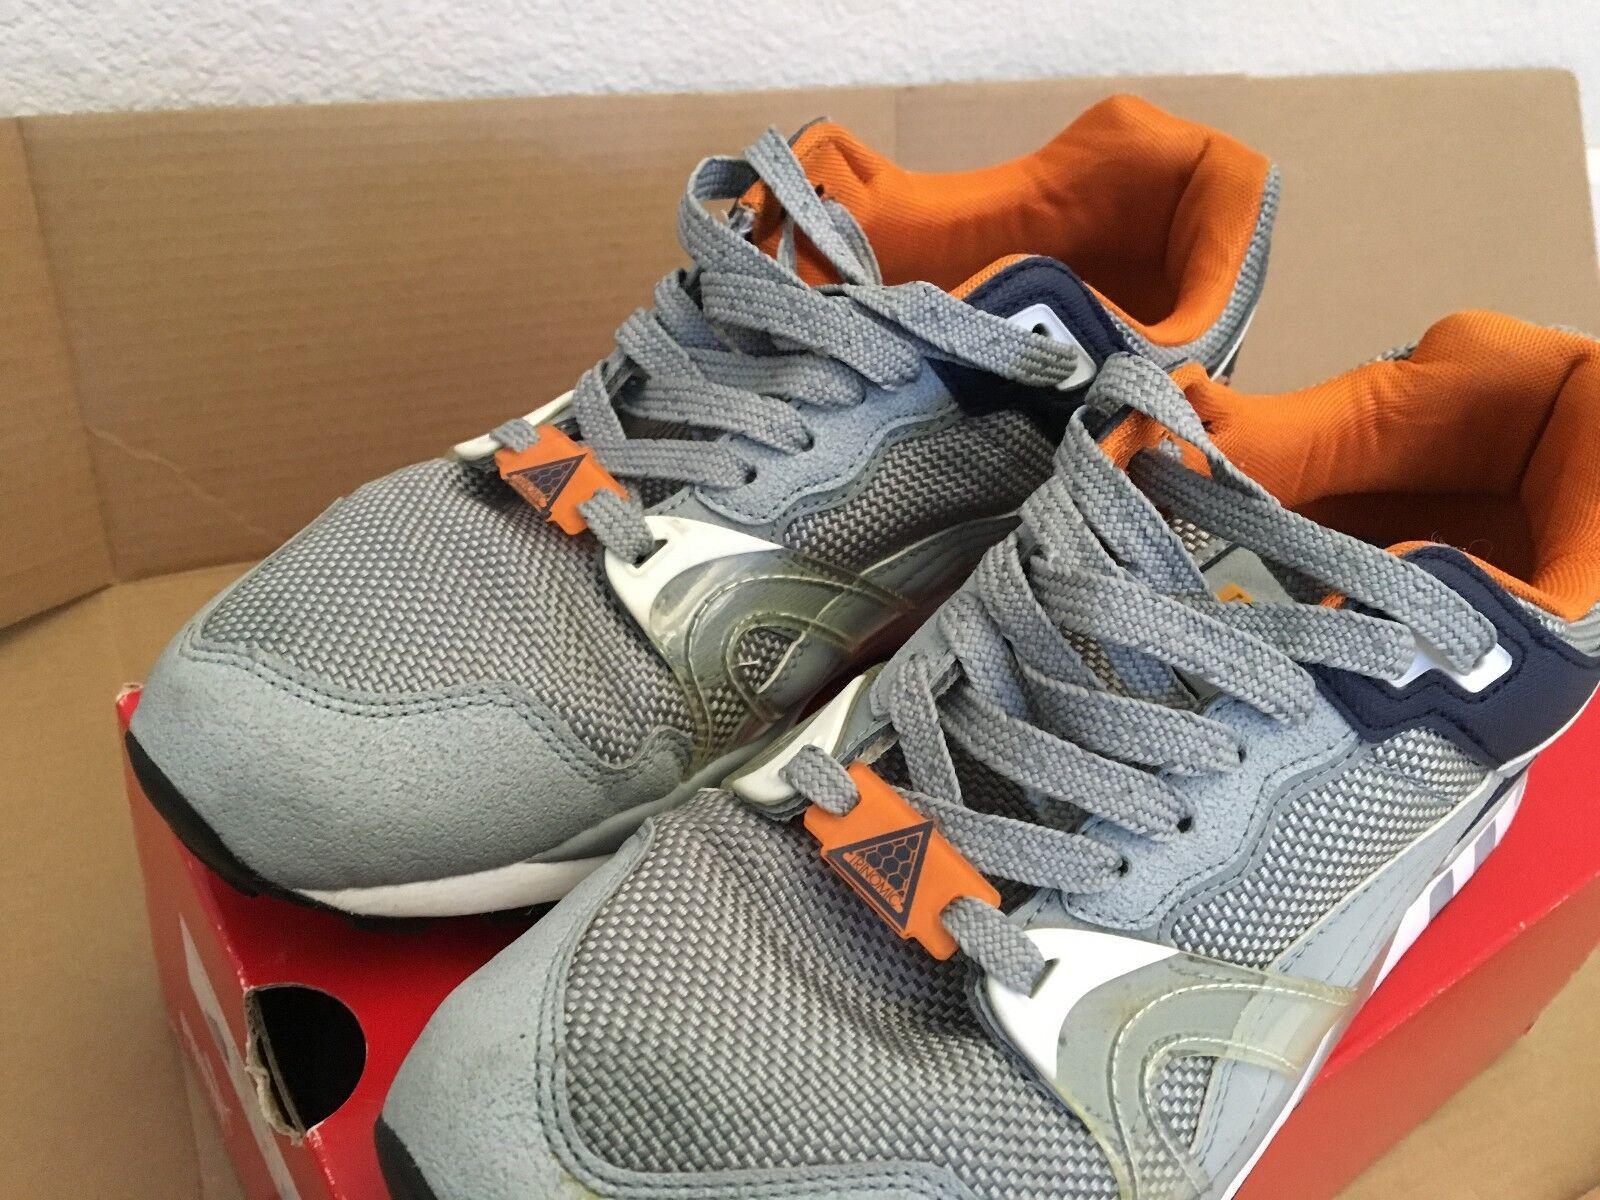 PUMA Men Schuhe Trinomic XT2 Plus Tech Schuhe Men 9.5 Silver Reflective Navy Orange 7fd18c